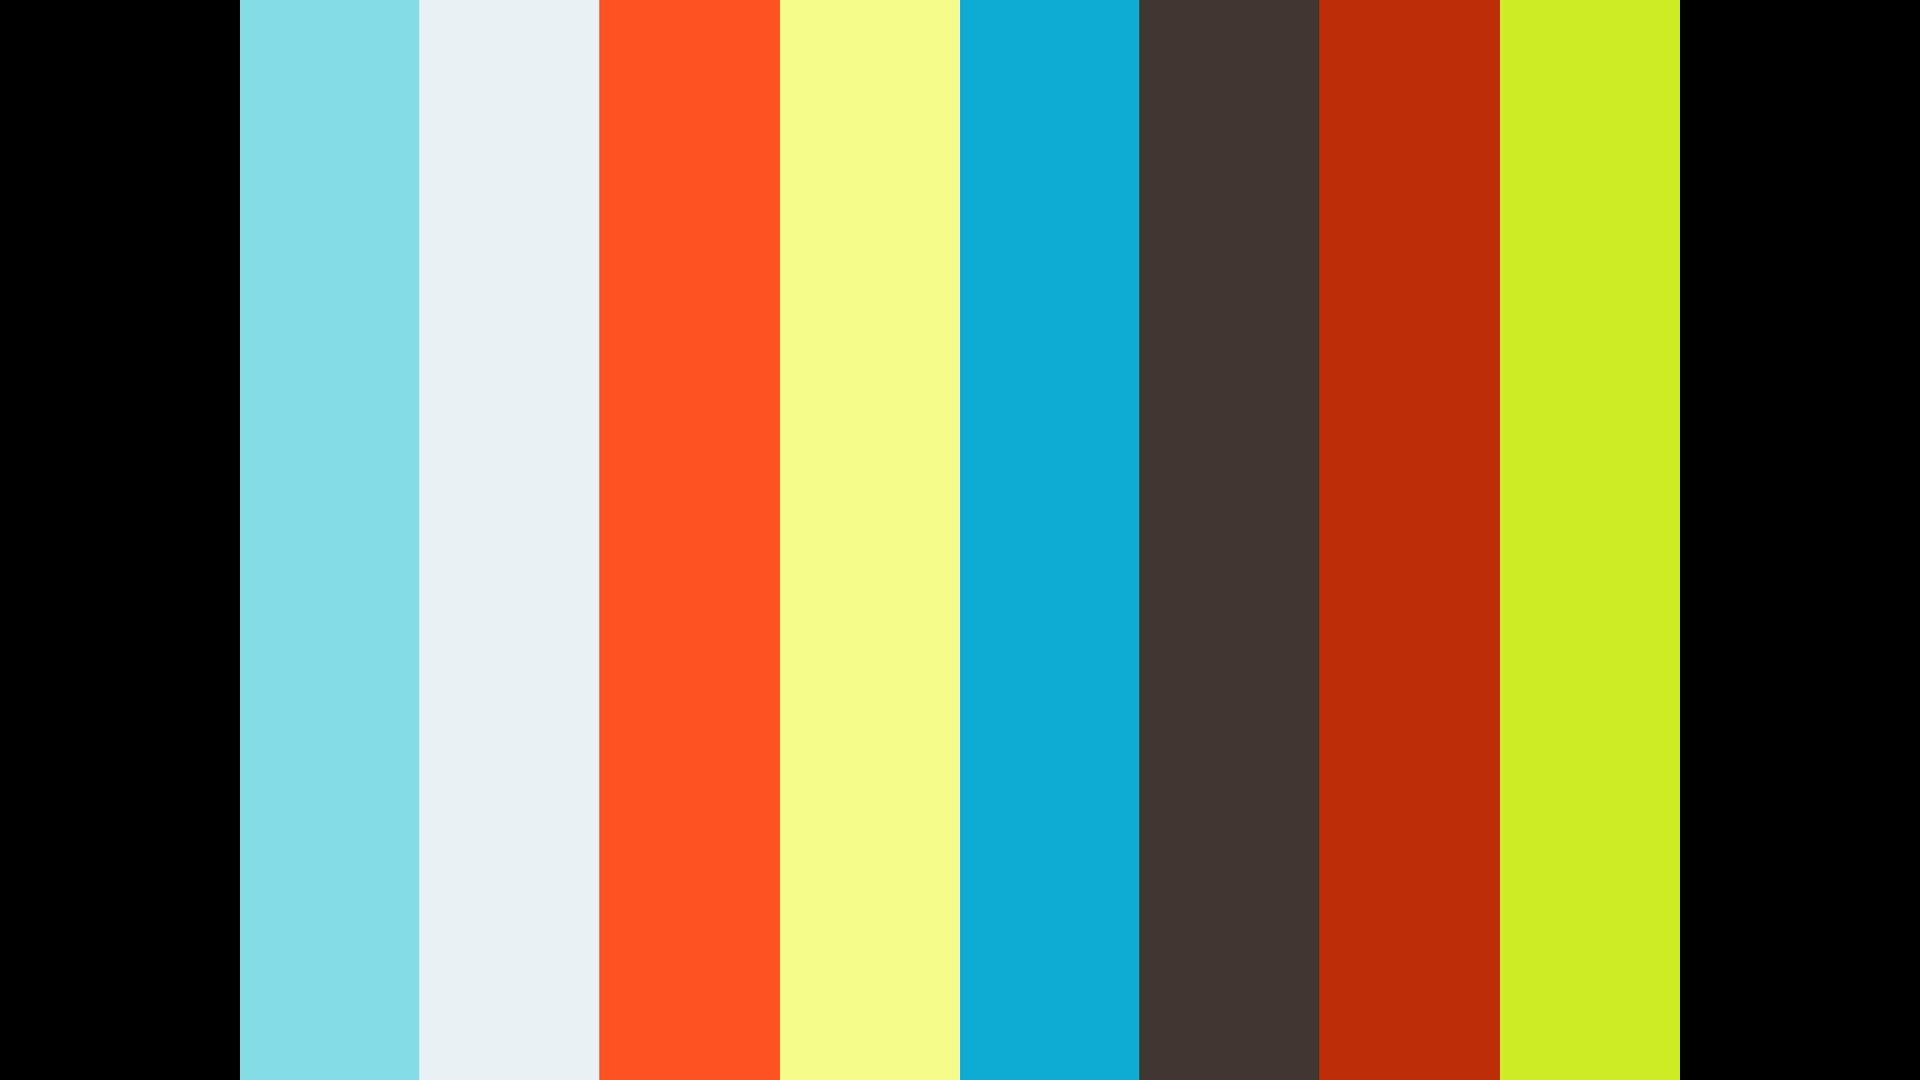 ANIMAL4_TOILEWEB02_VIMEO